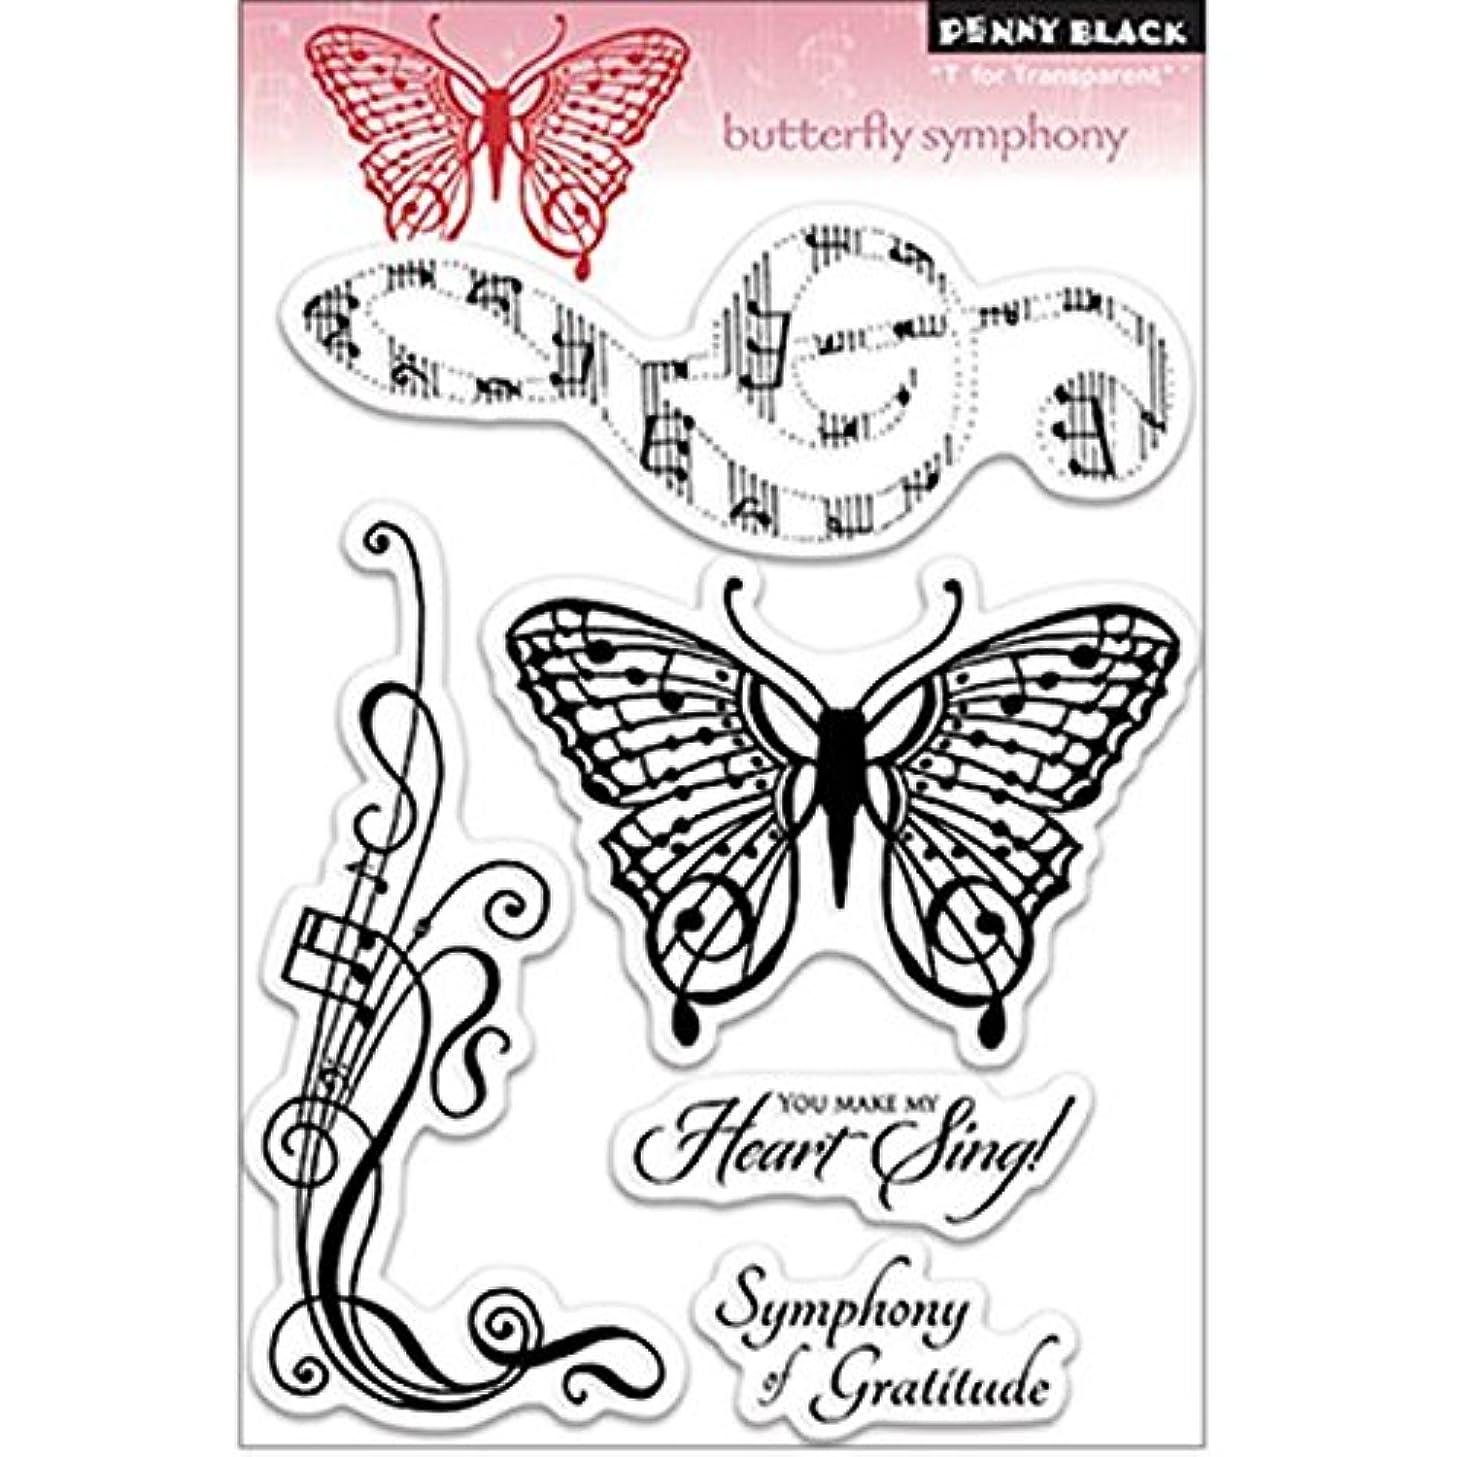 Penny Black 30-148 Clear Stamp, Butterfly Symphony